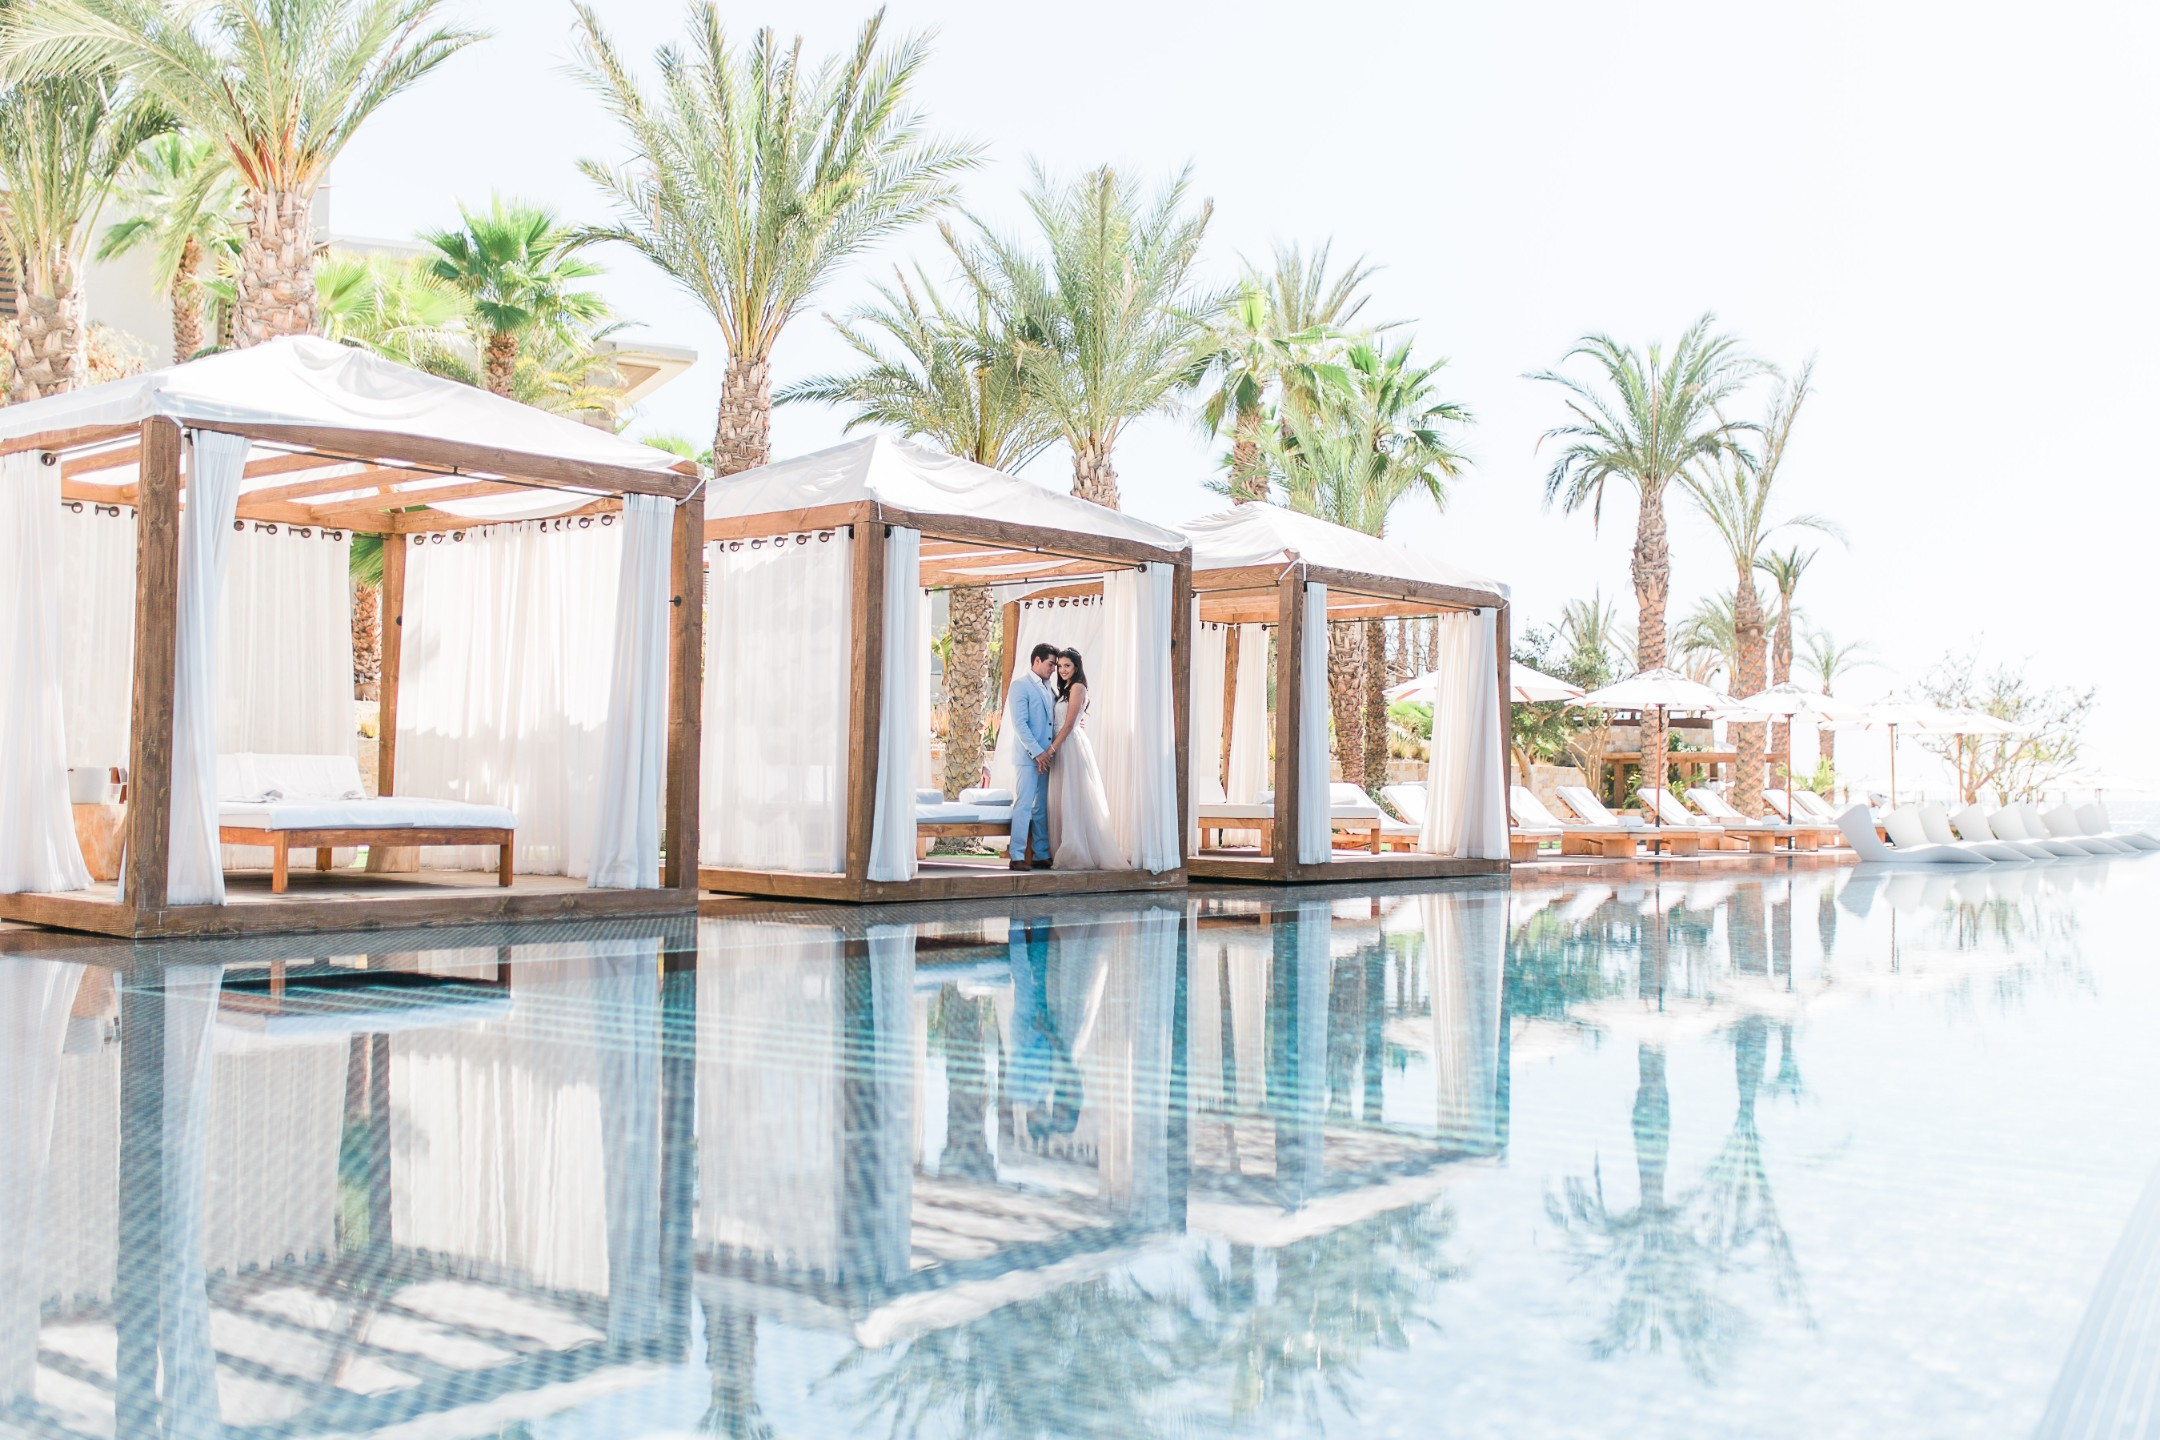 Los Cabos Wedding Photographer - Destination Wedding - Chileno Bay Resort Wedding Photos (4).jpg